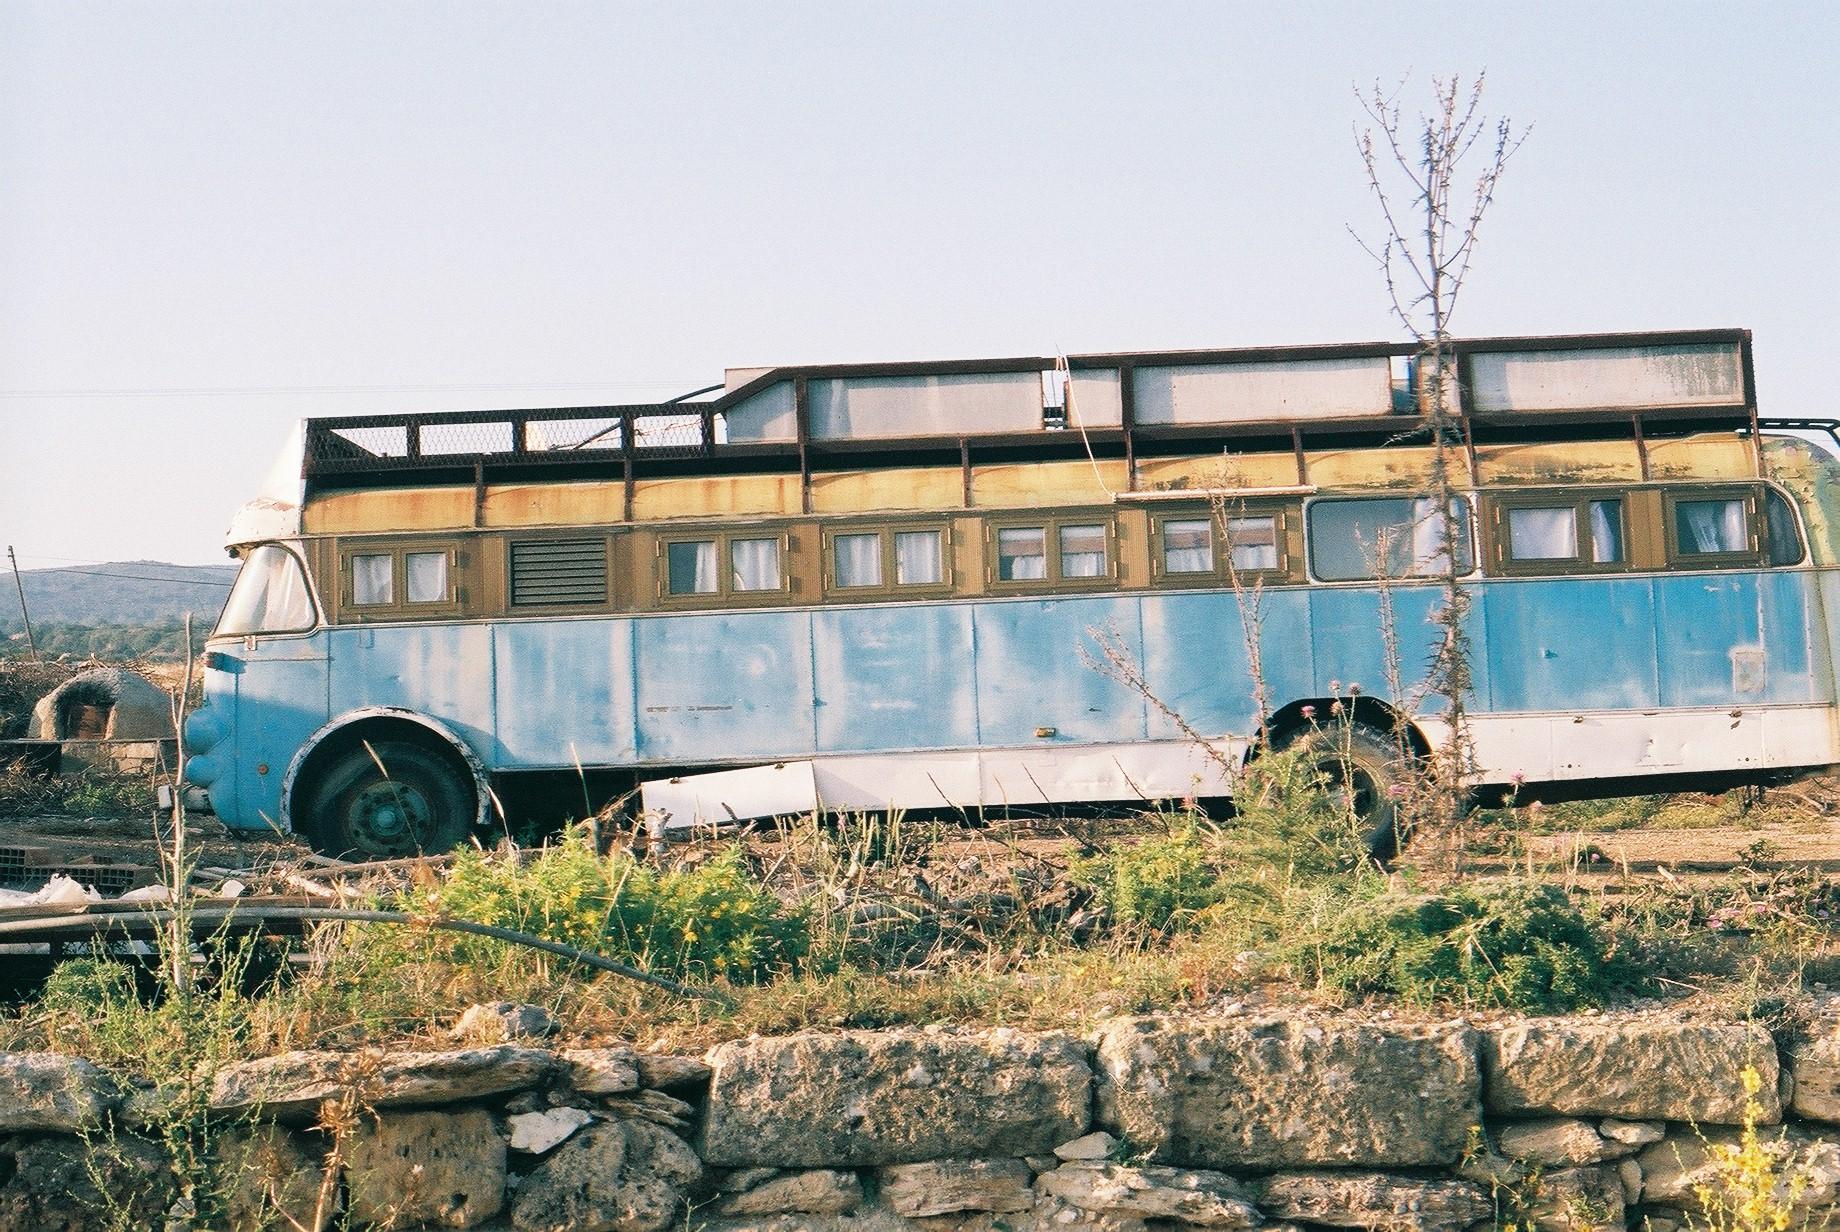 bus, street photography, north cyprus, camper van, cyprus, 35mm, canon, canon ae-1, travel photography, film photography, explore, street, film is not dead, shoot film, i love film, exploration